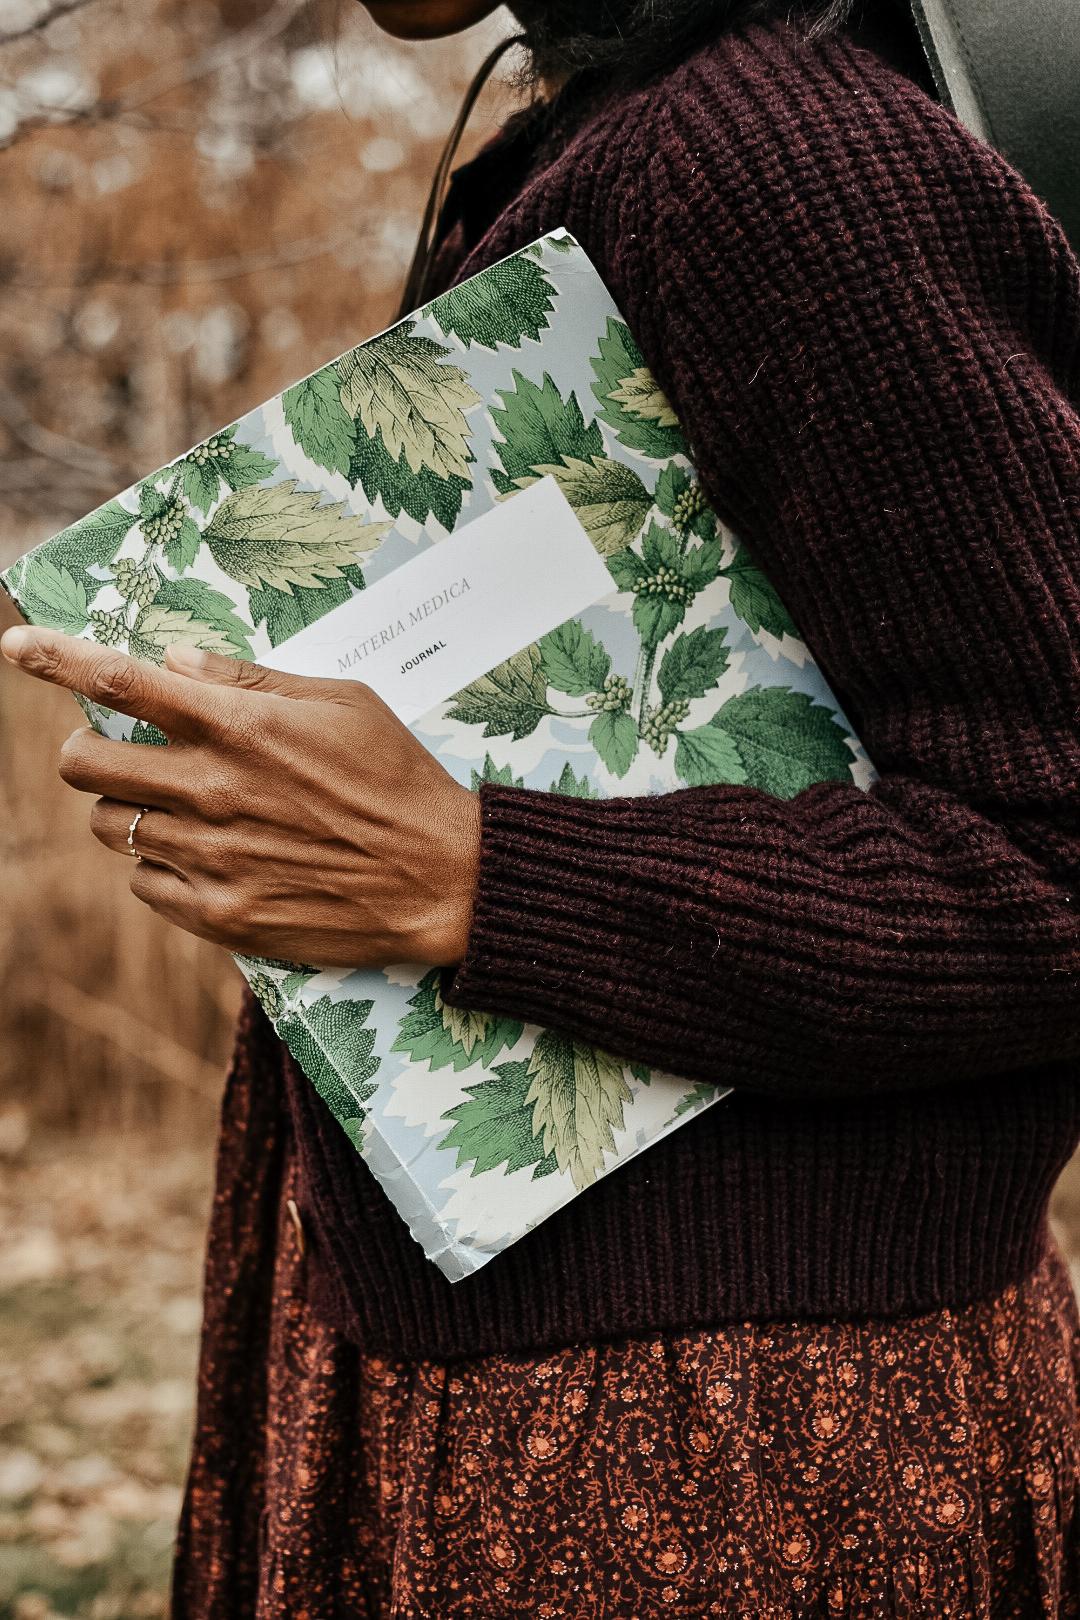 Herbal Academy Herbal materia medica journal